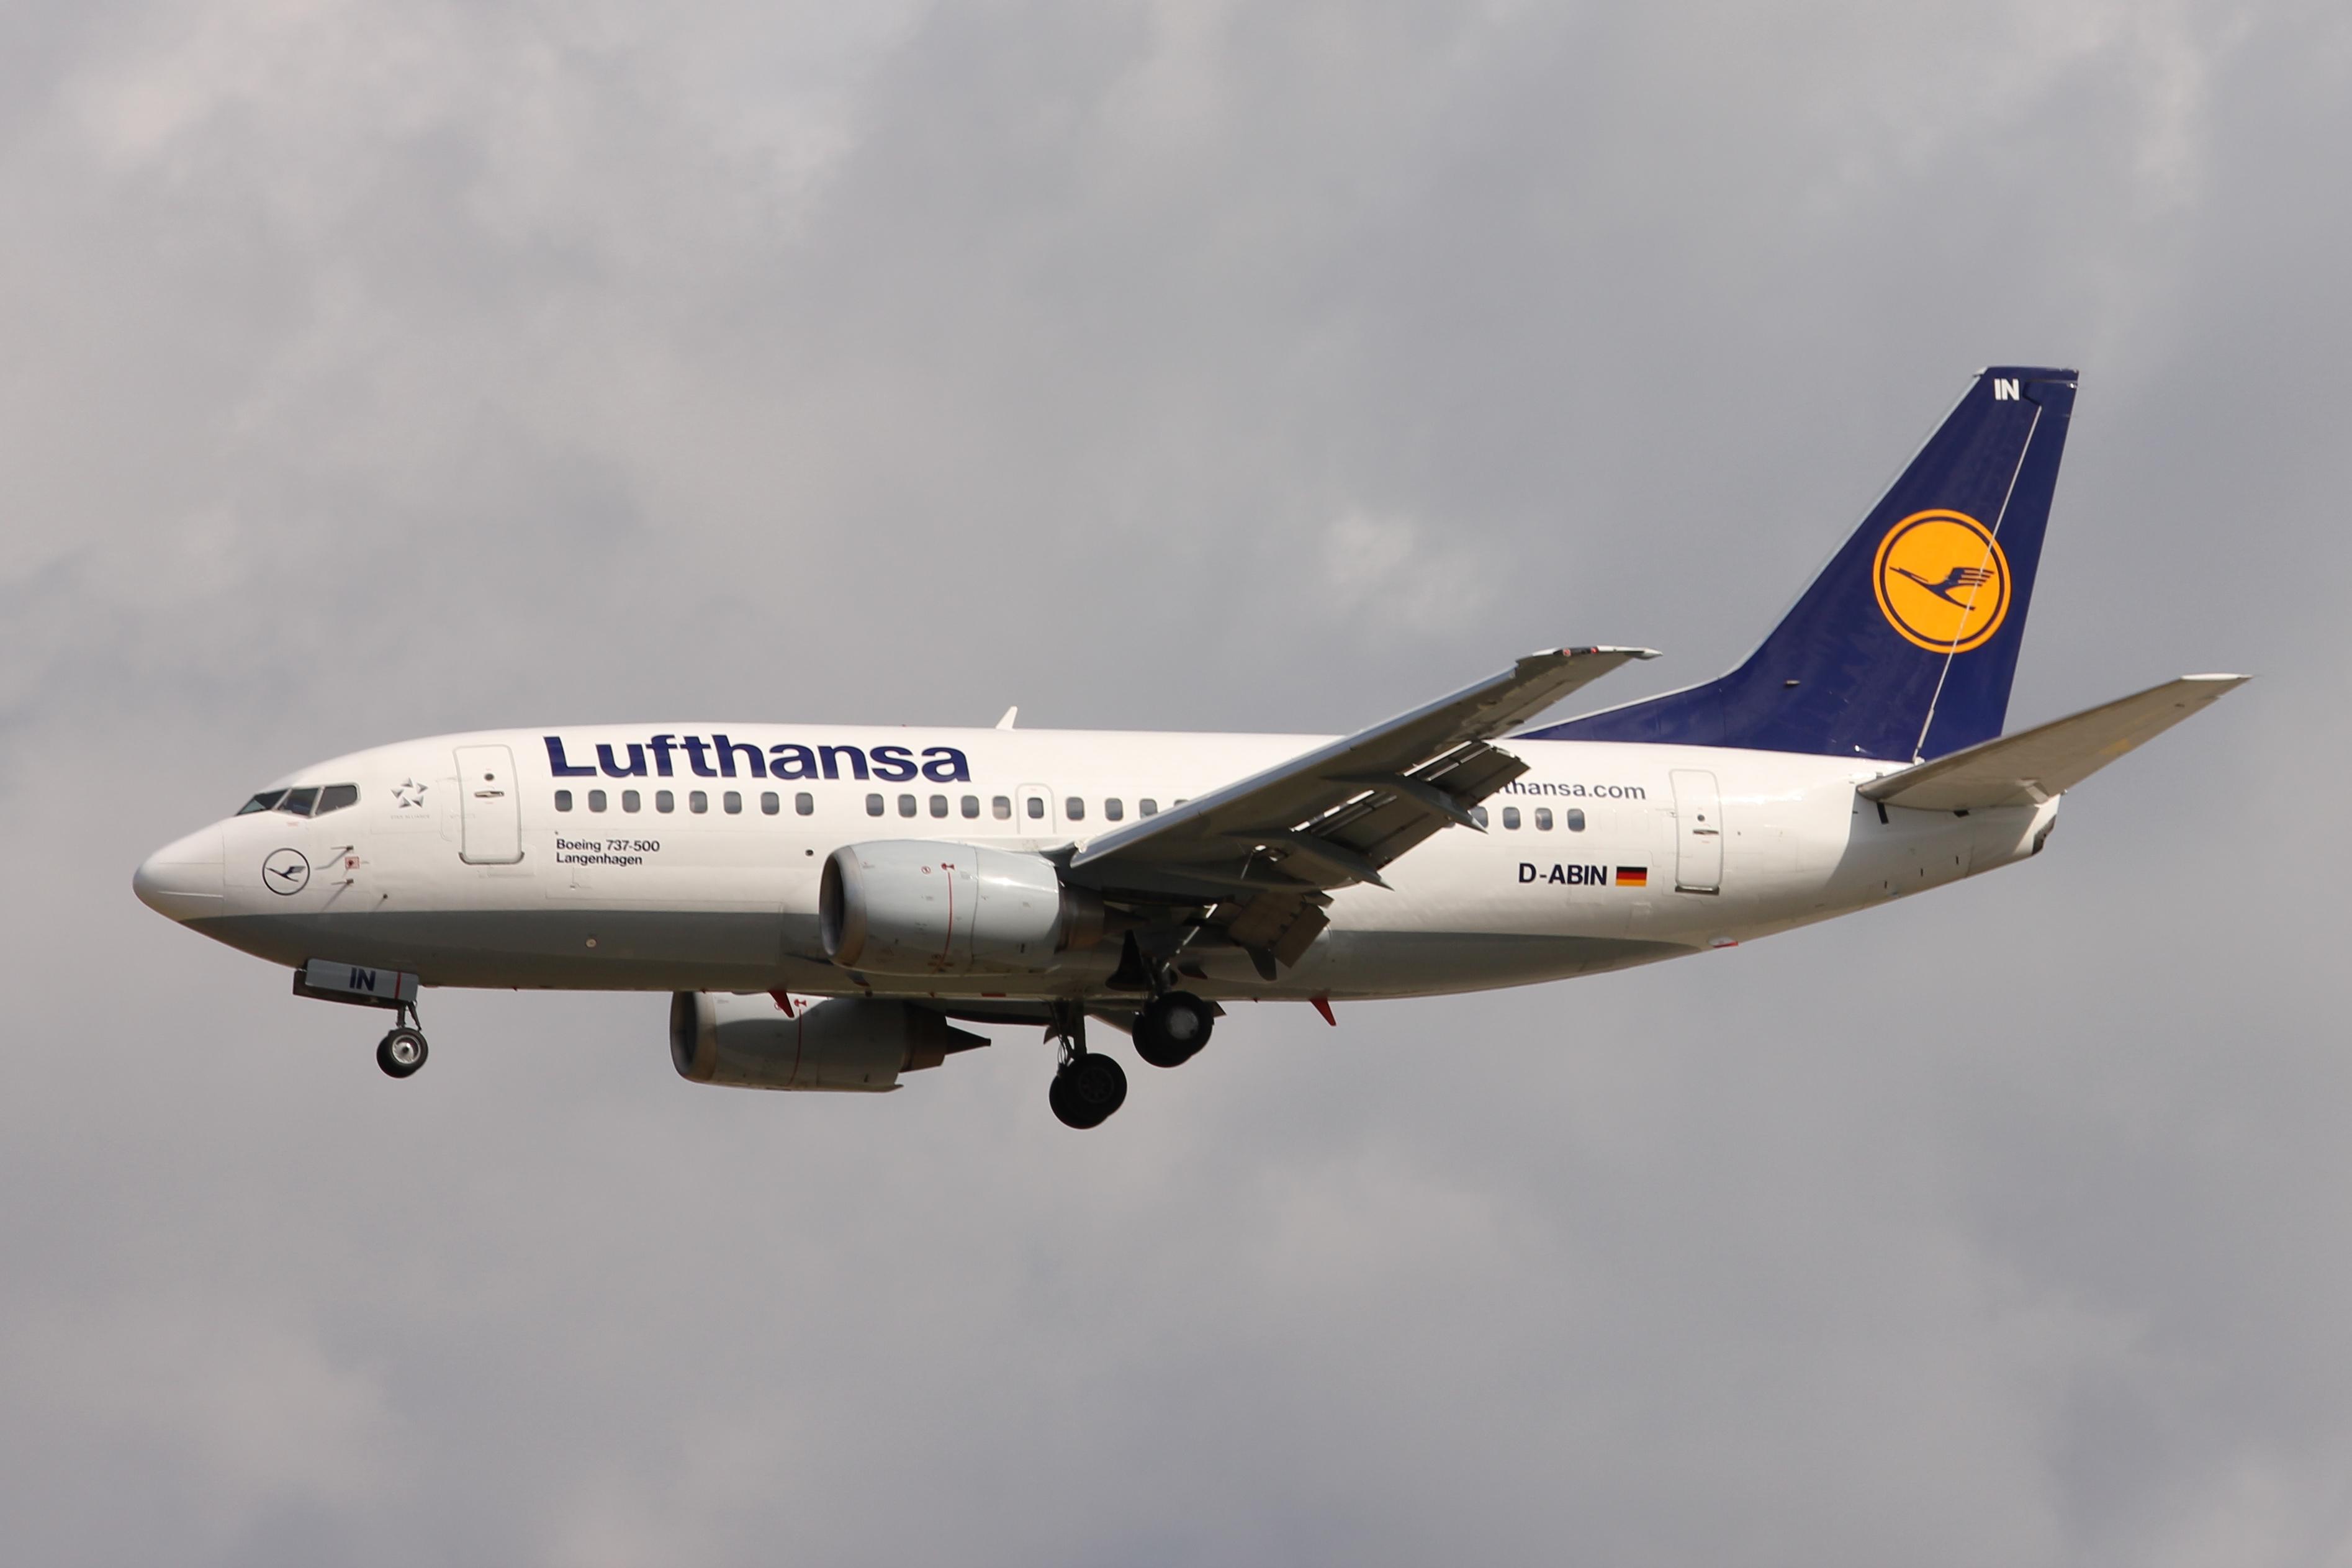 File:Lufthansa 735 D-ABIN.JPG